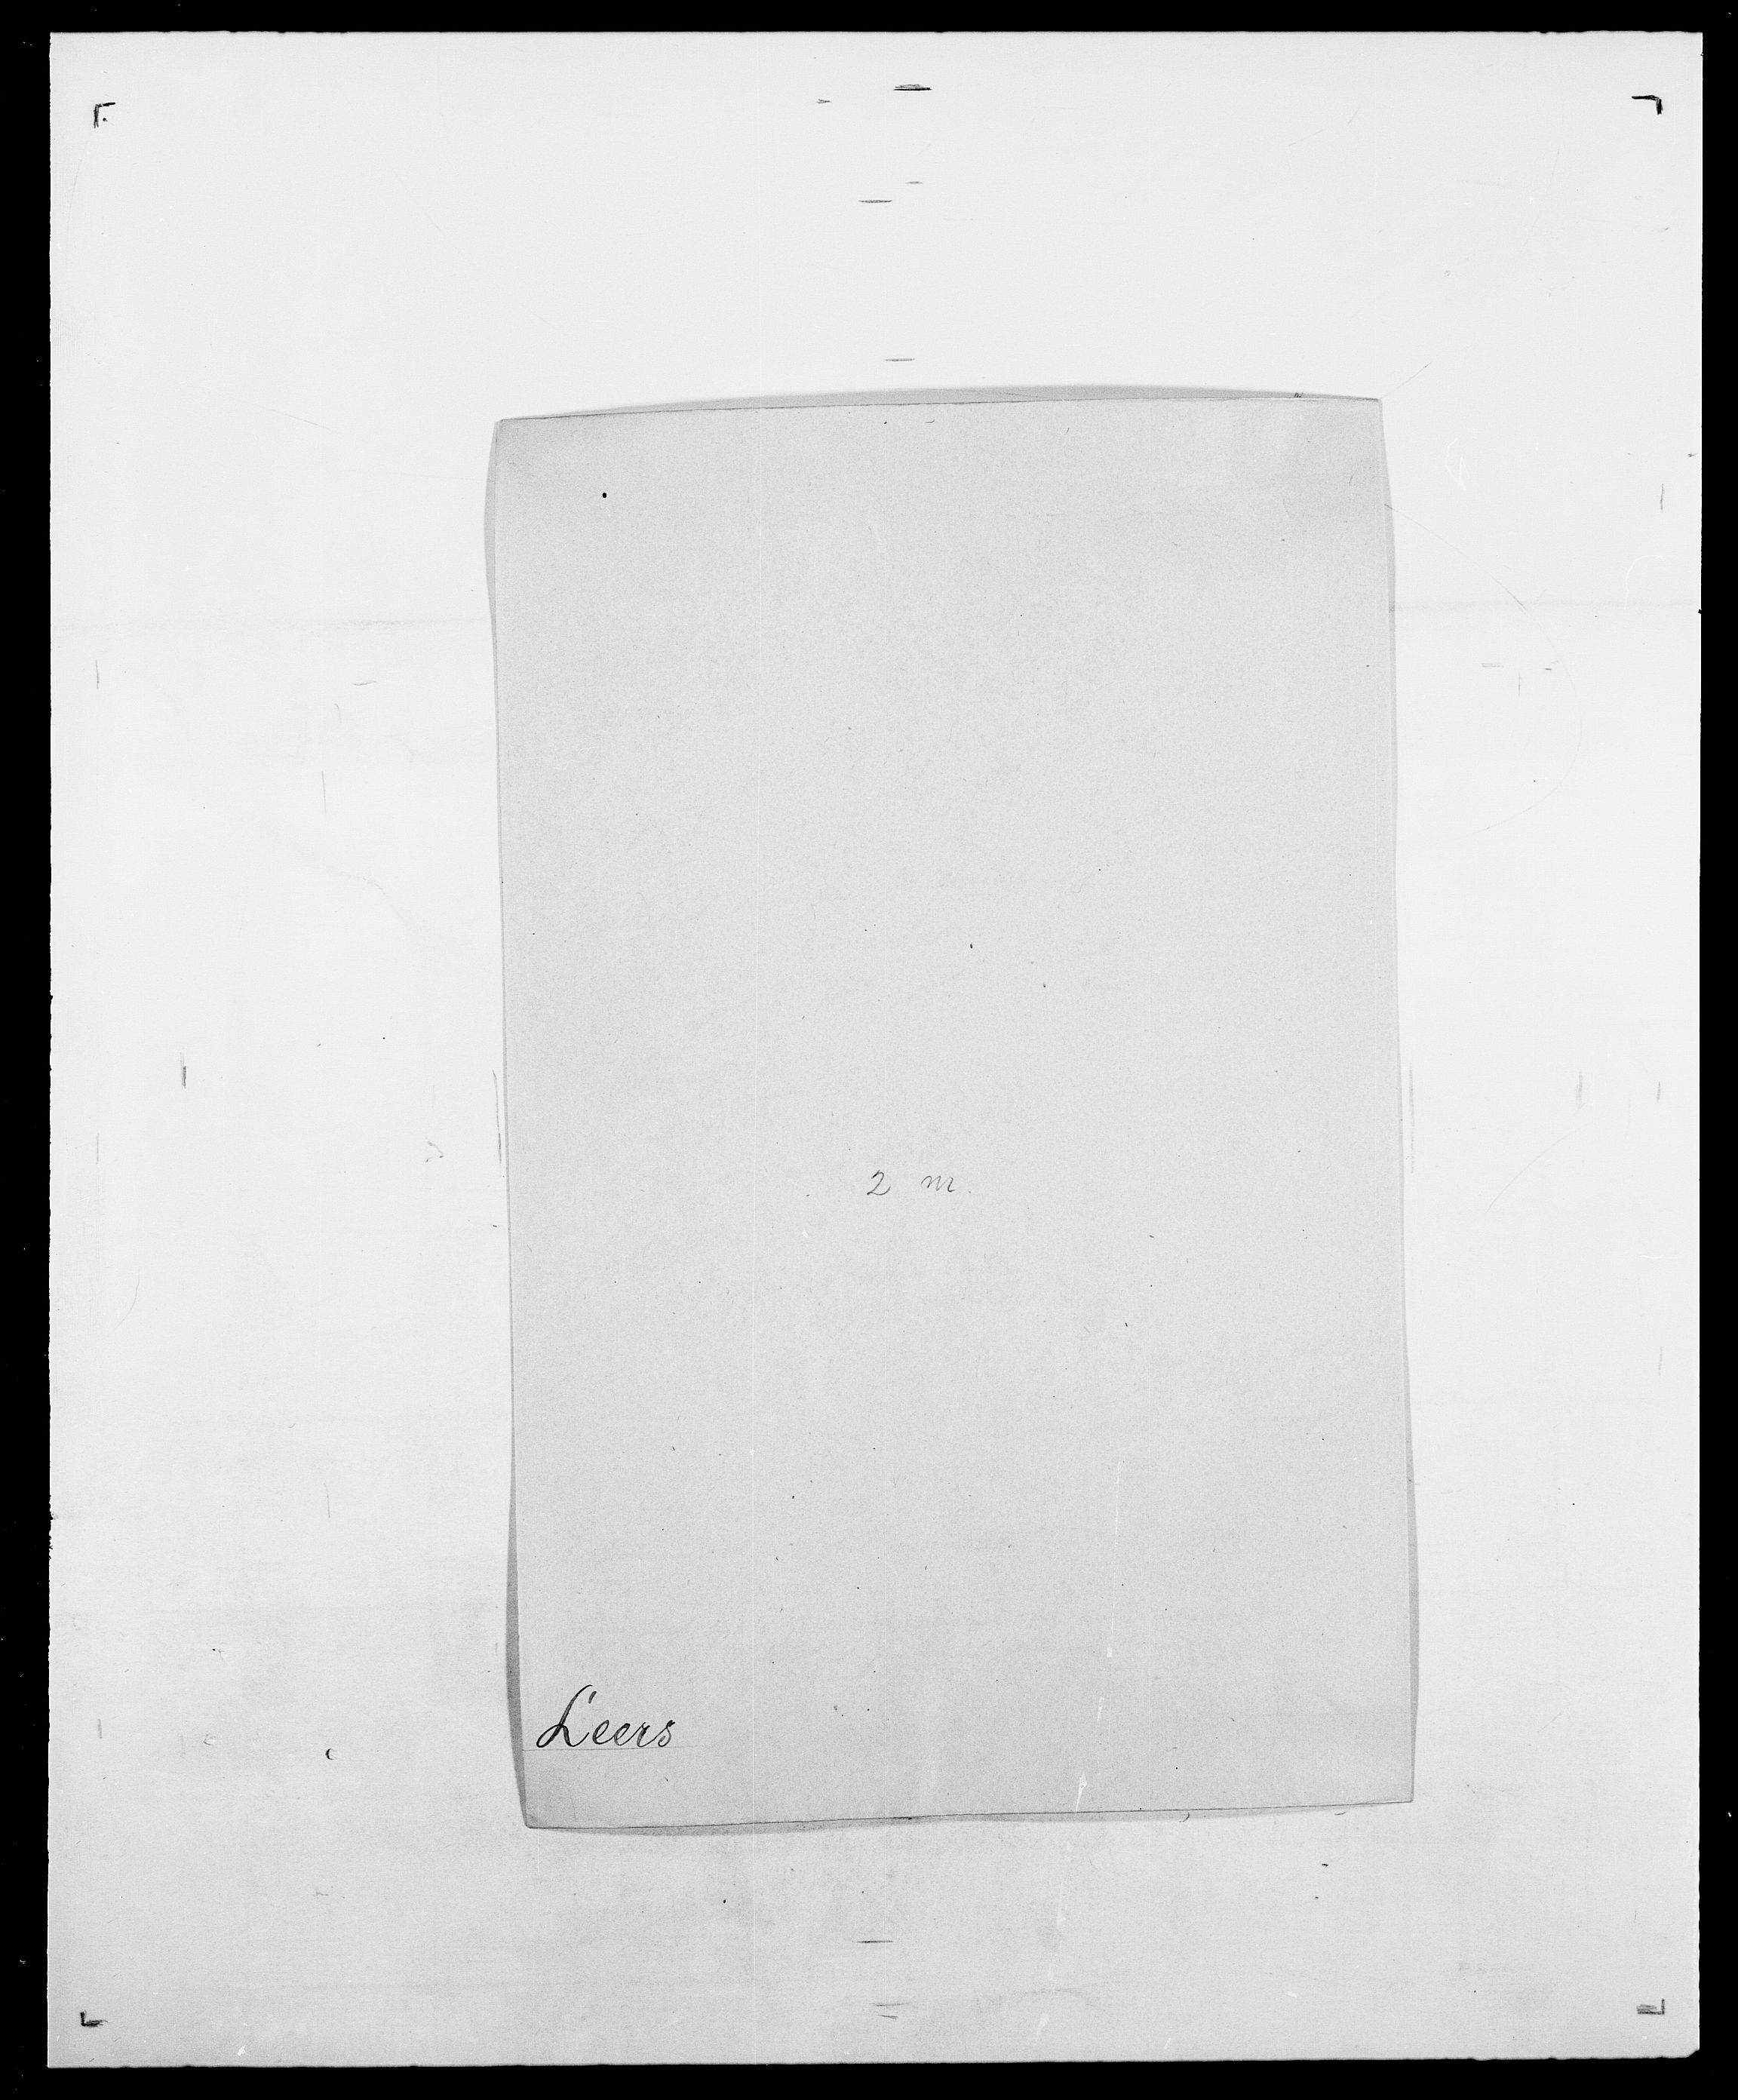 SAO, Delgobe, Charles Antoine - samling, D/Da/L0023: Lau - Lirvyn, s. 79